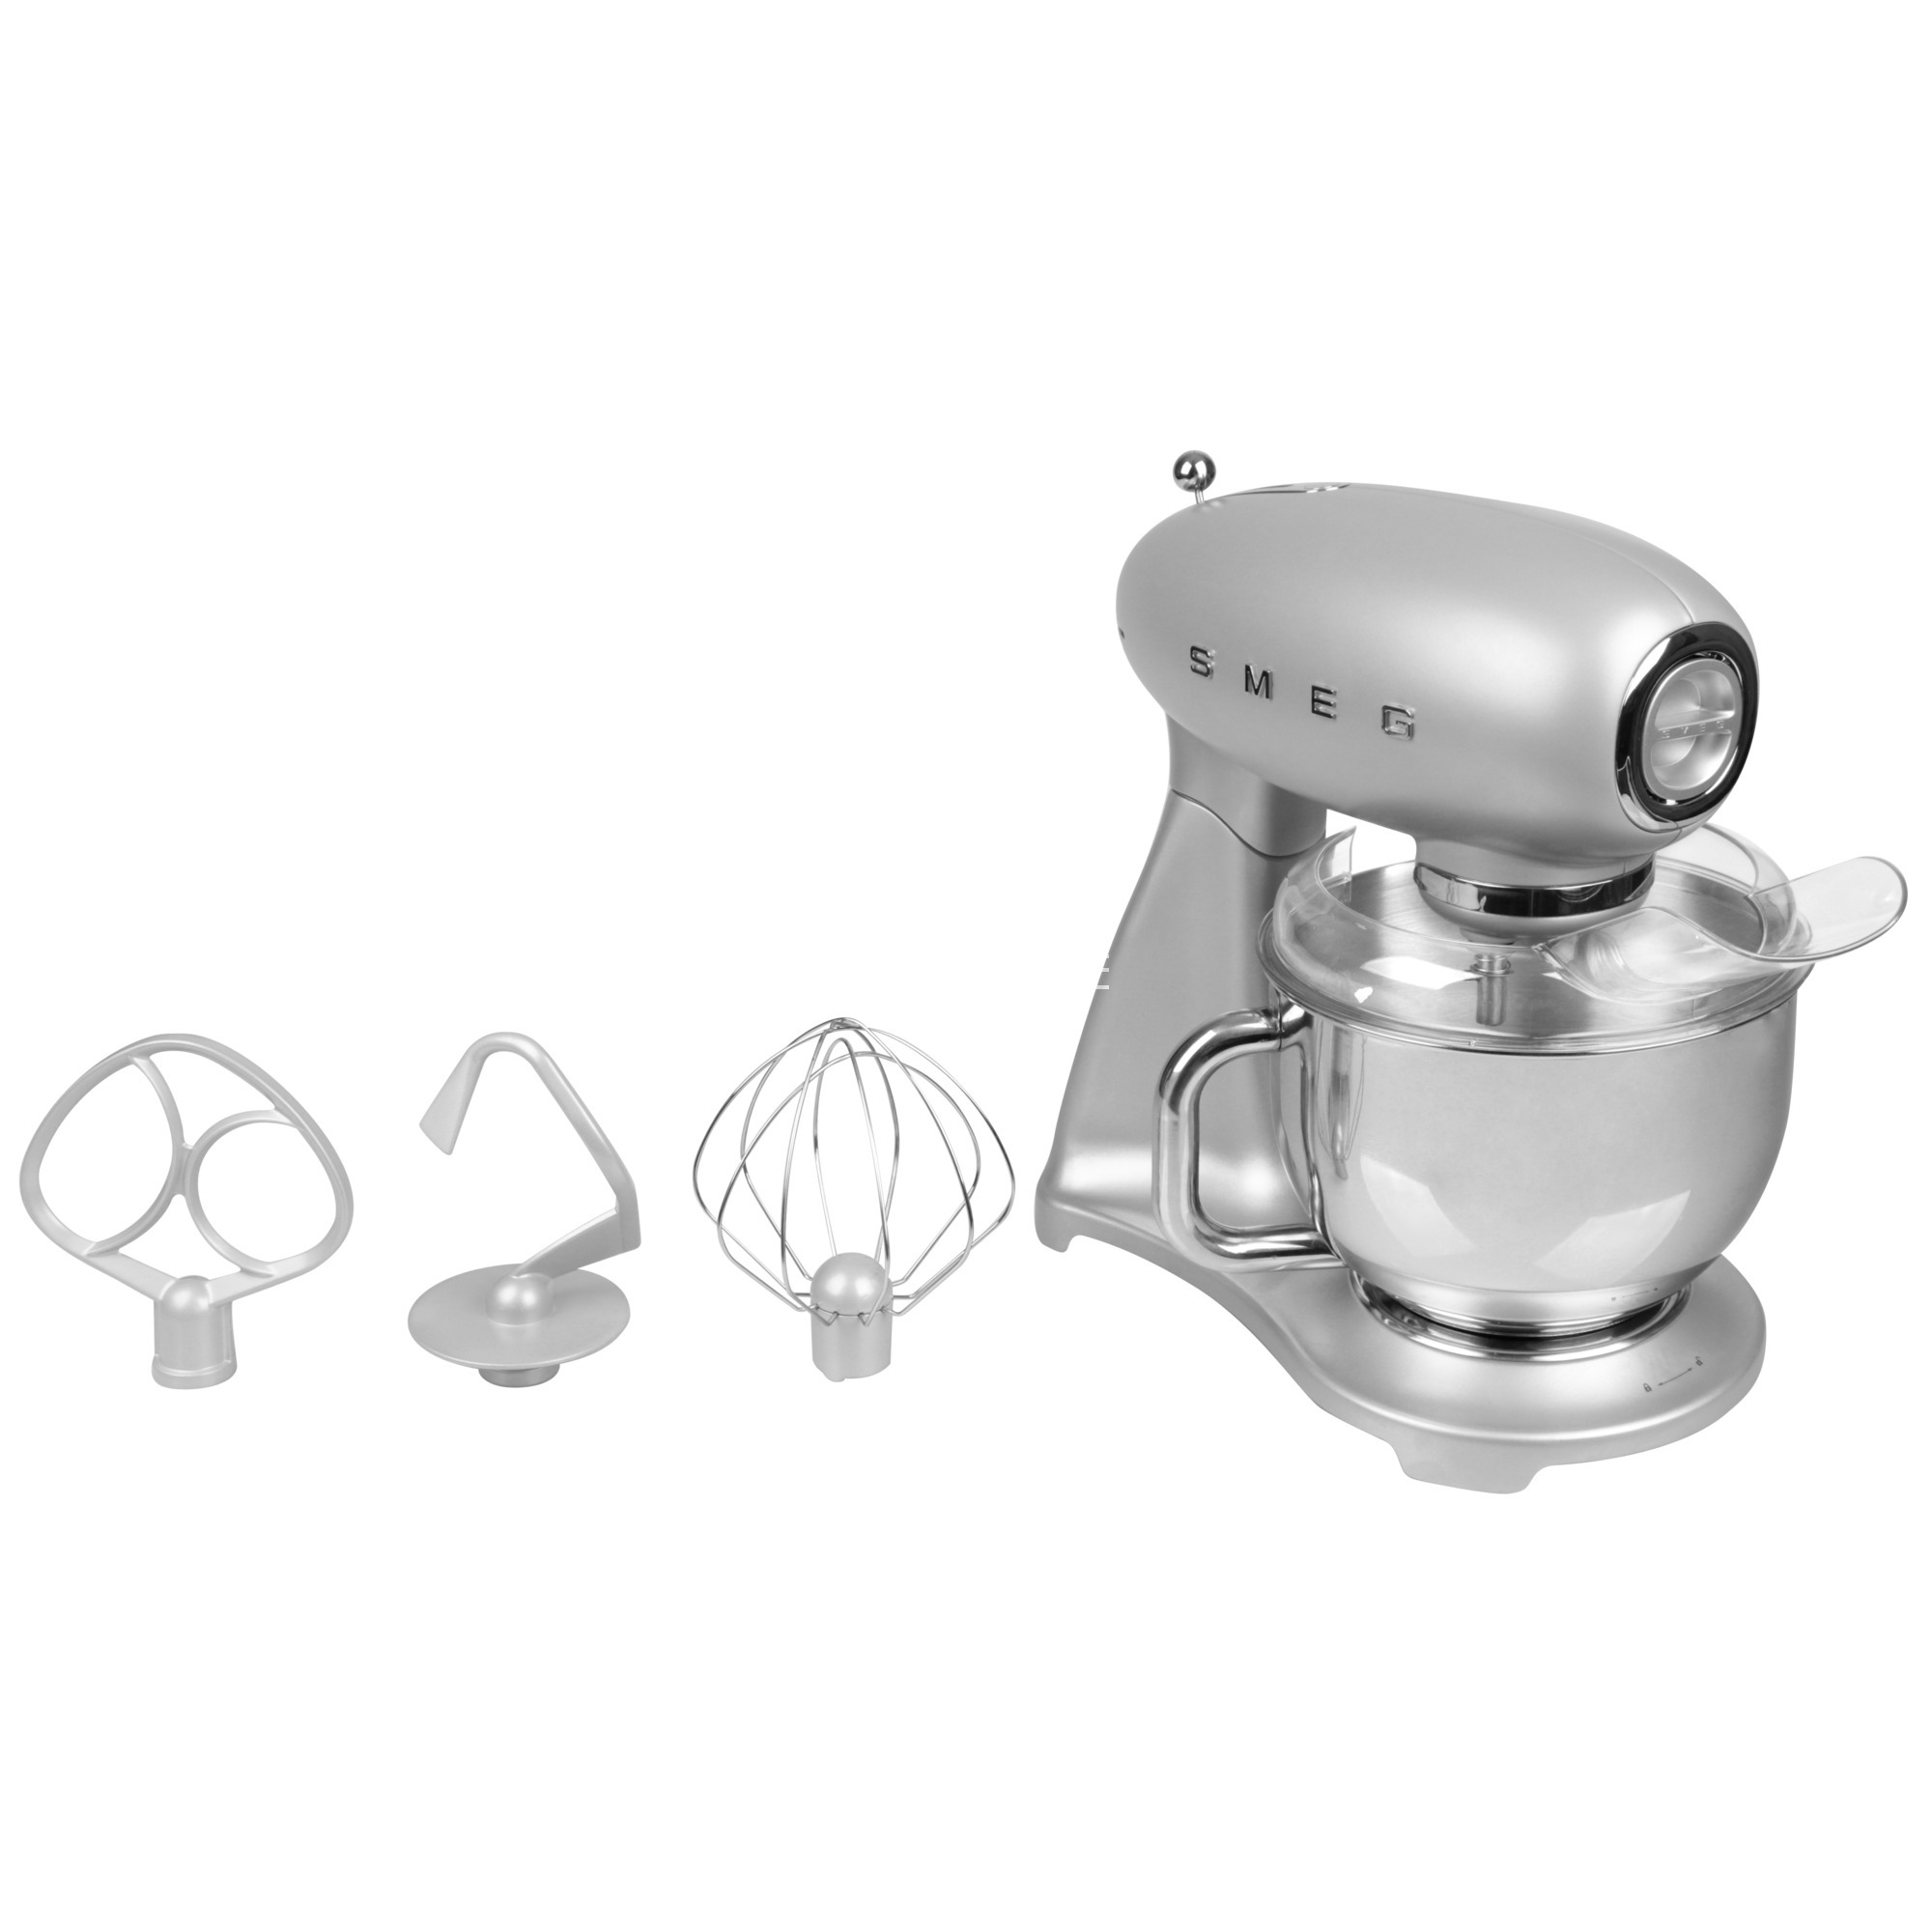 SMF01SVEU batidora Batidora de varillas Plata 800 W, Robot de cocina